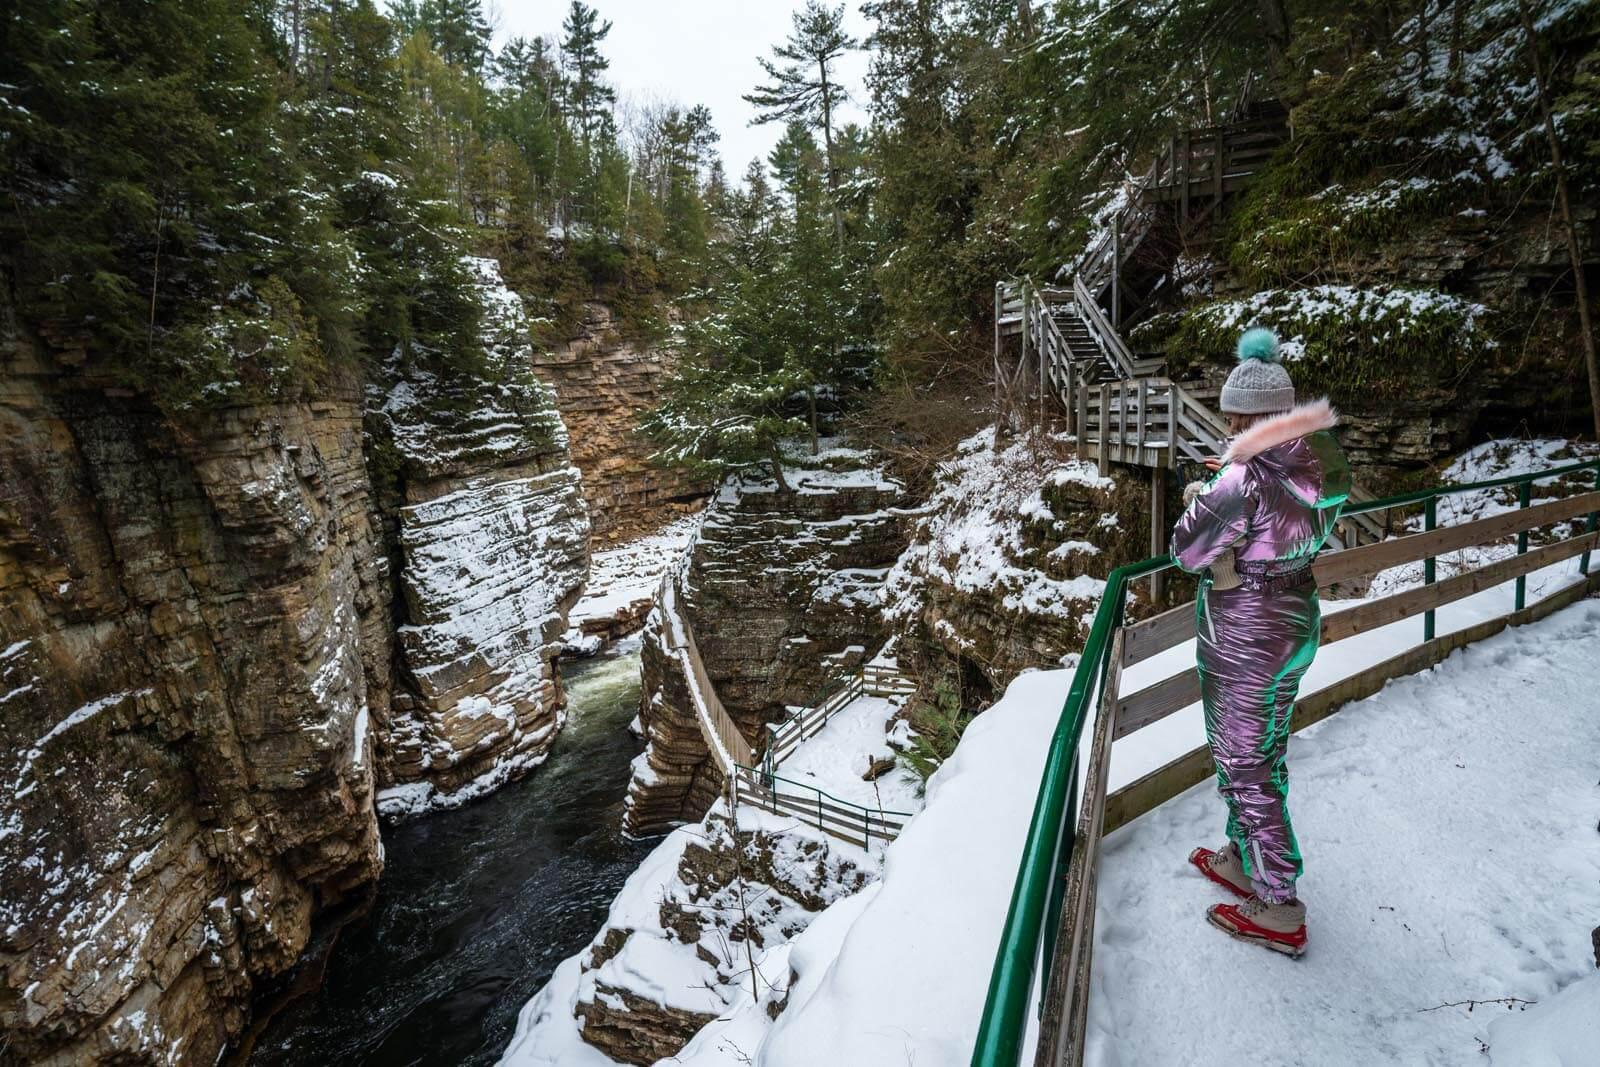 visiting ausable chasm in winter adirondcks in upstate new york